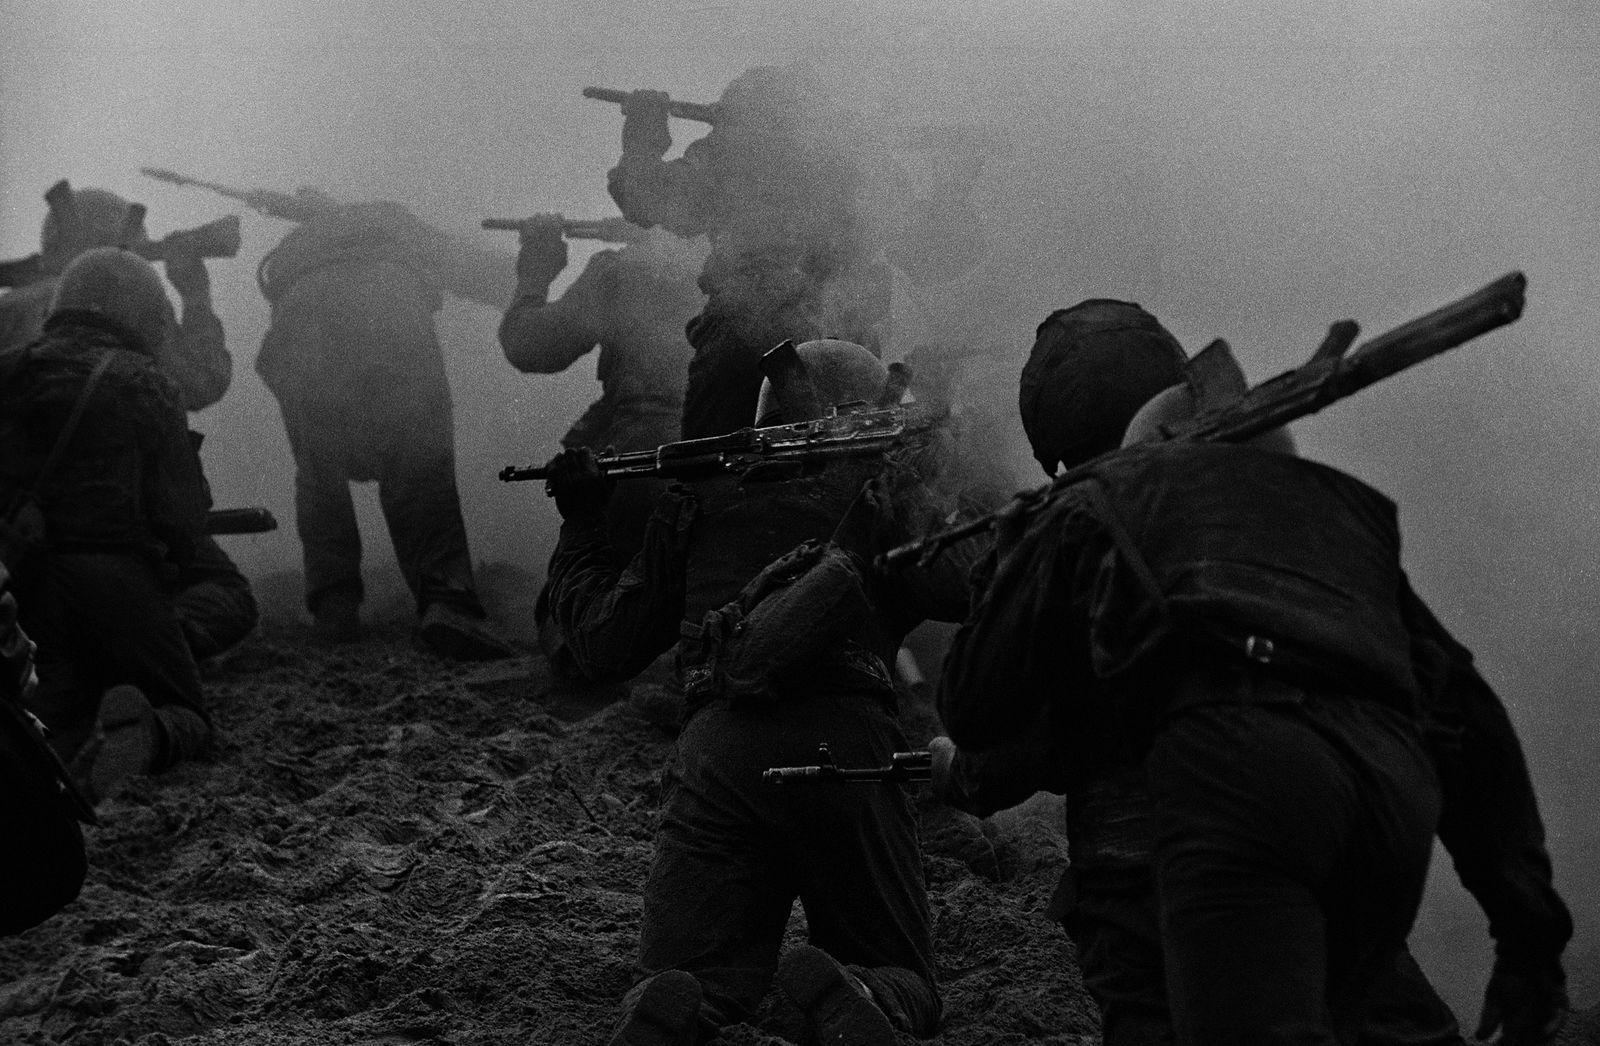 «Солдатский труд» ©Фото Владимира Вяткина, vladimir-vyatkin.photographer.ru